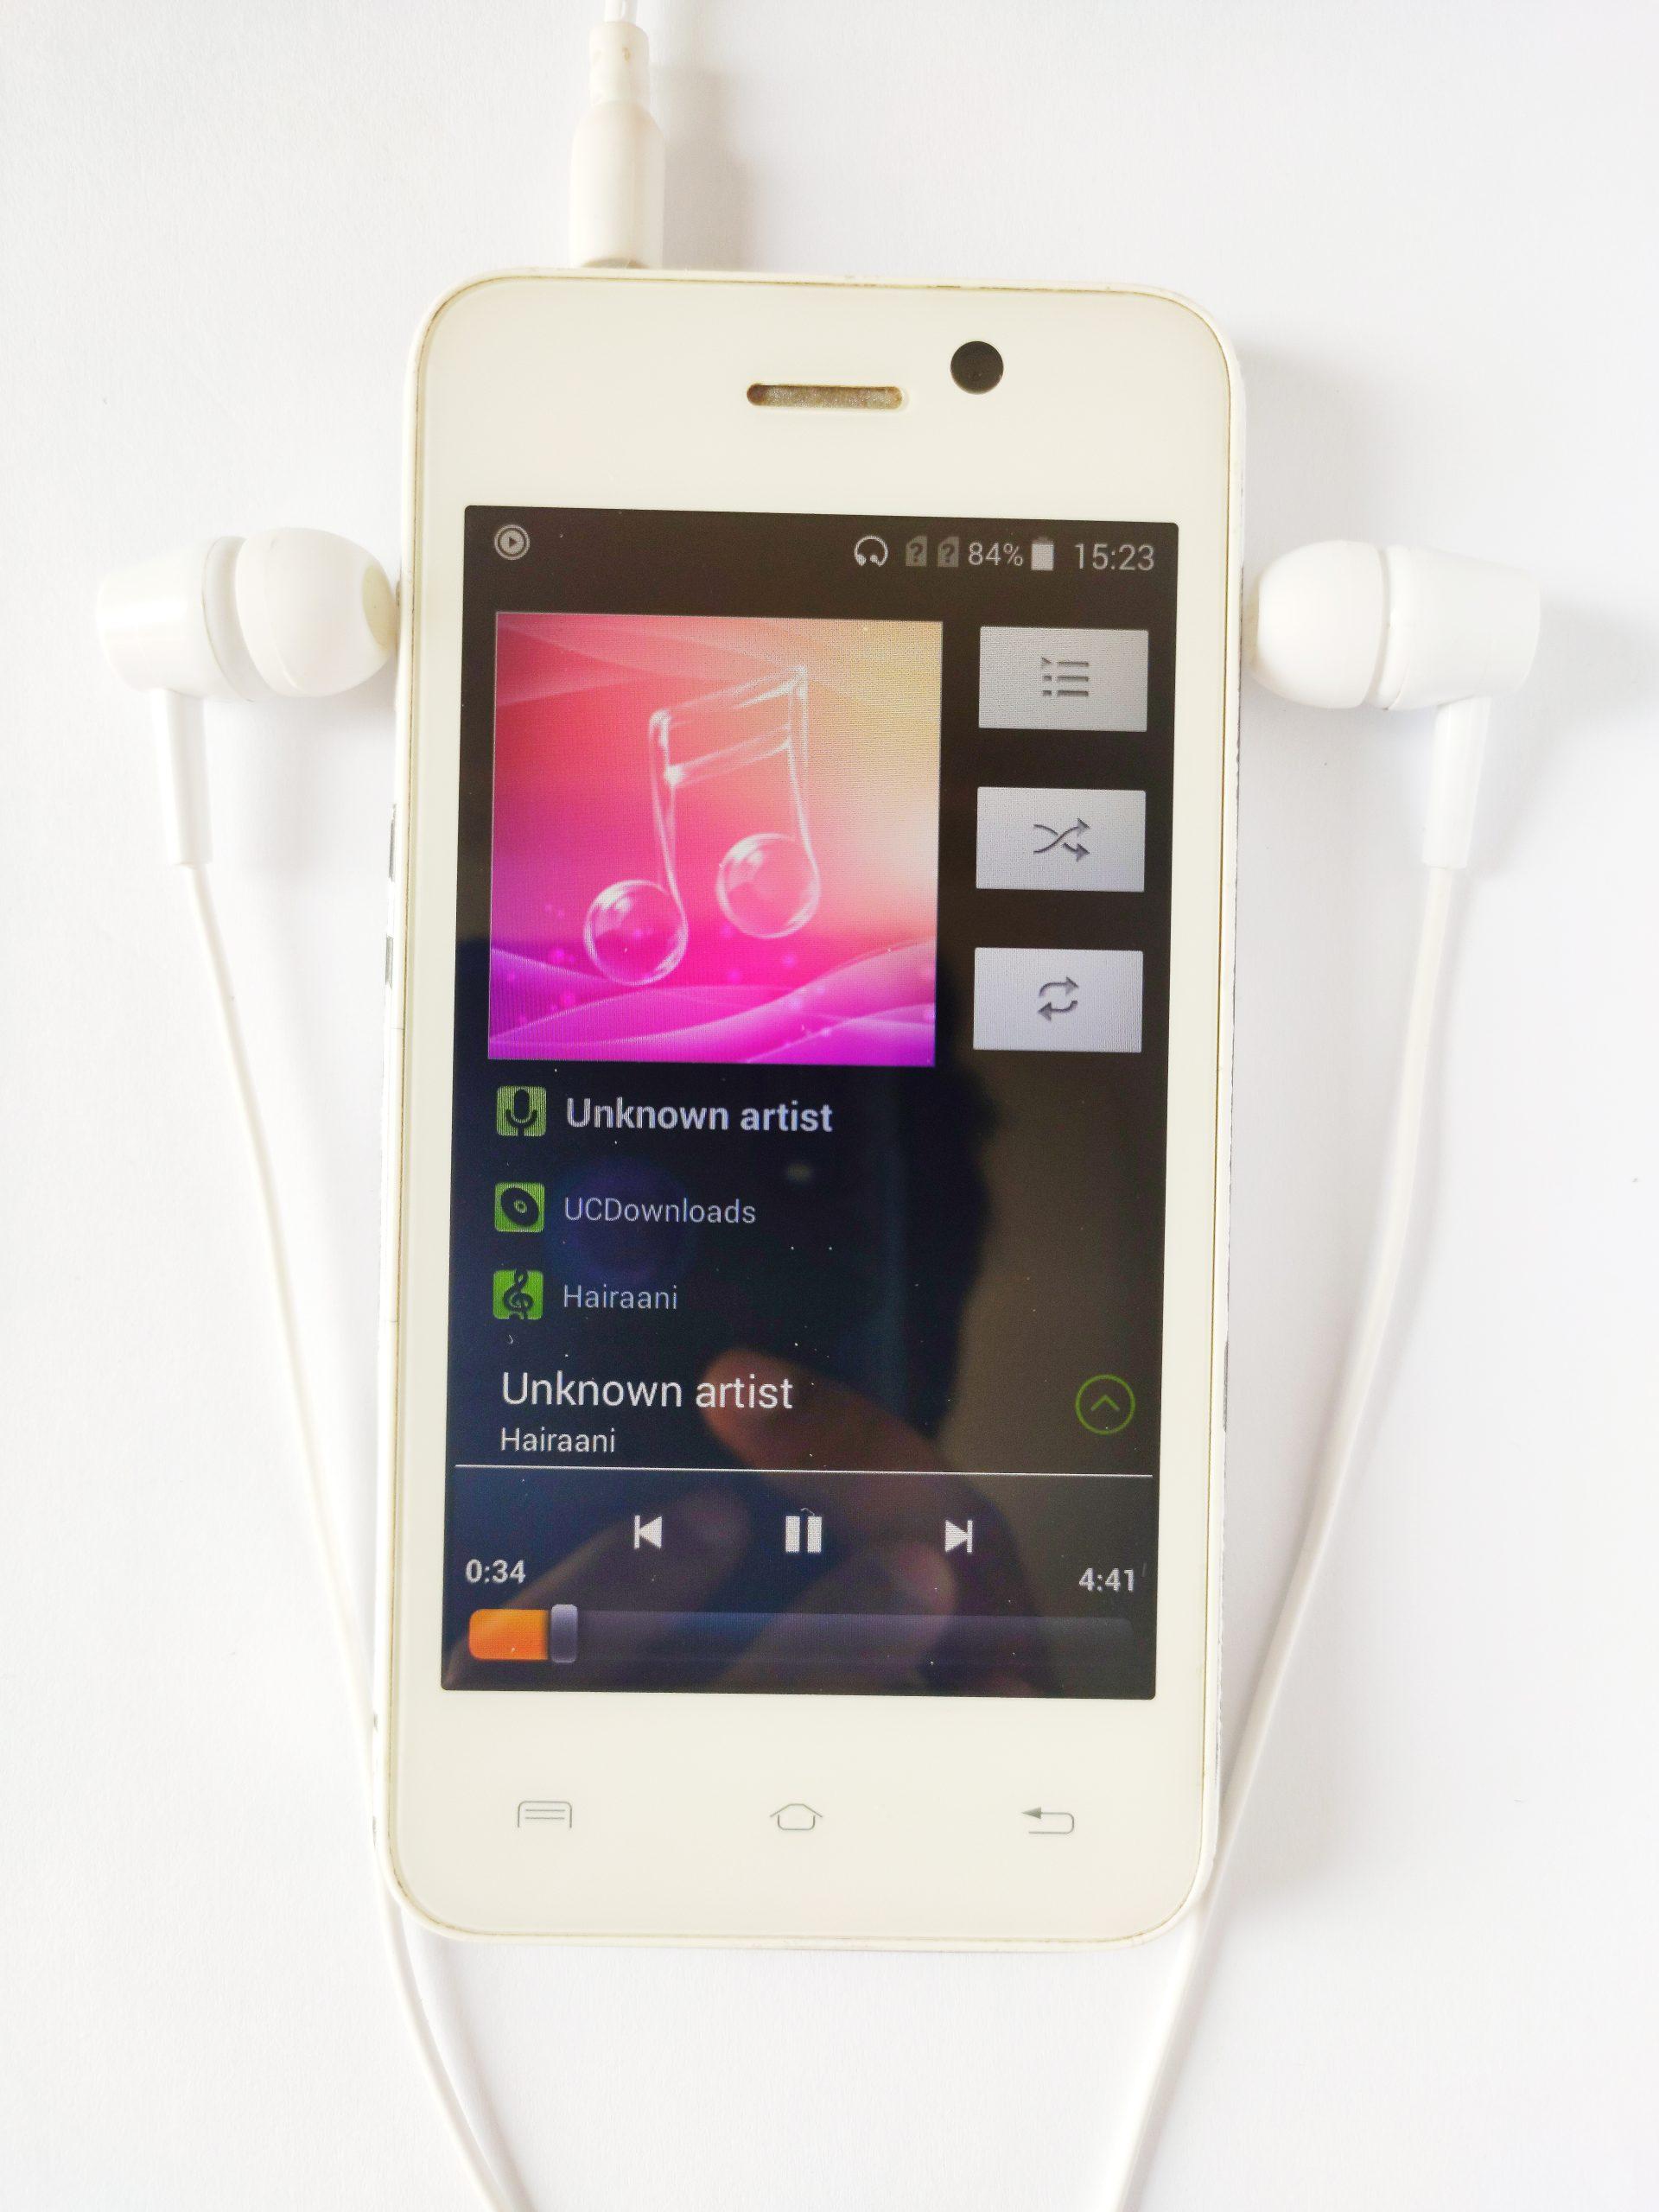 Phone with earphone